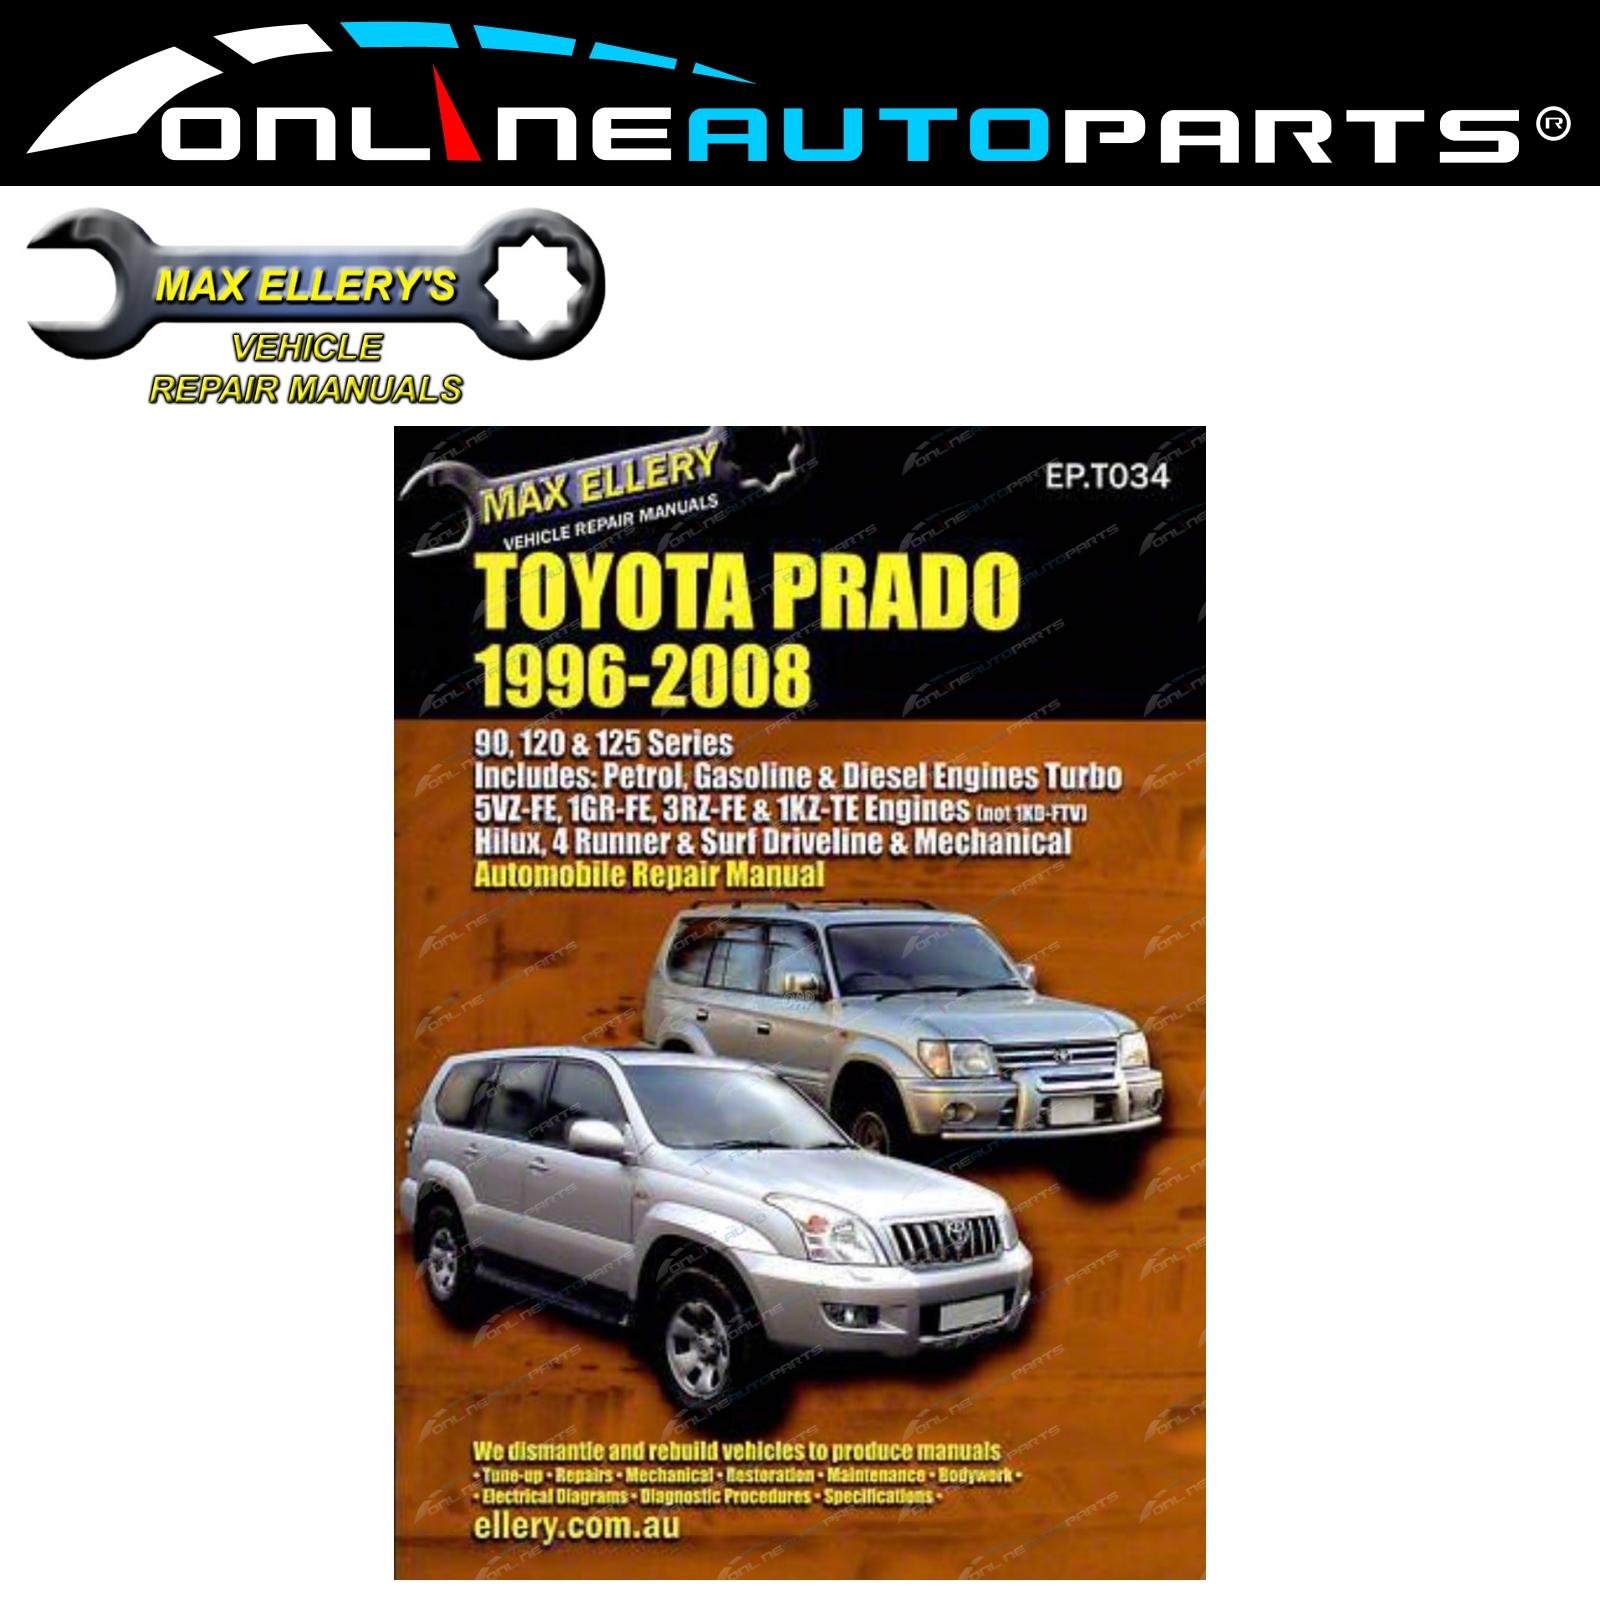 workshop repair manual suits toyota landcruiser prado 96 08 book rh ebay com au Toyota Land Cruiser Prado 2018 2000 Toyota Land Cruiser Prado